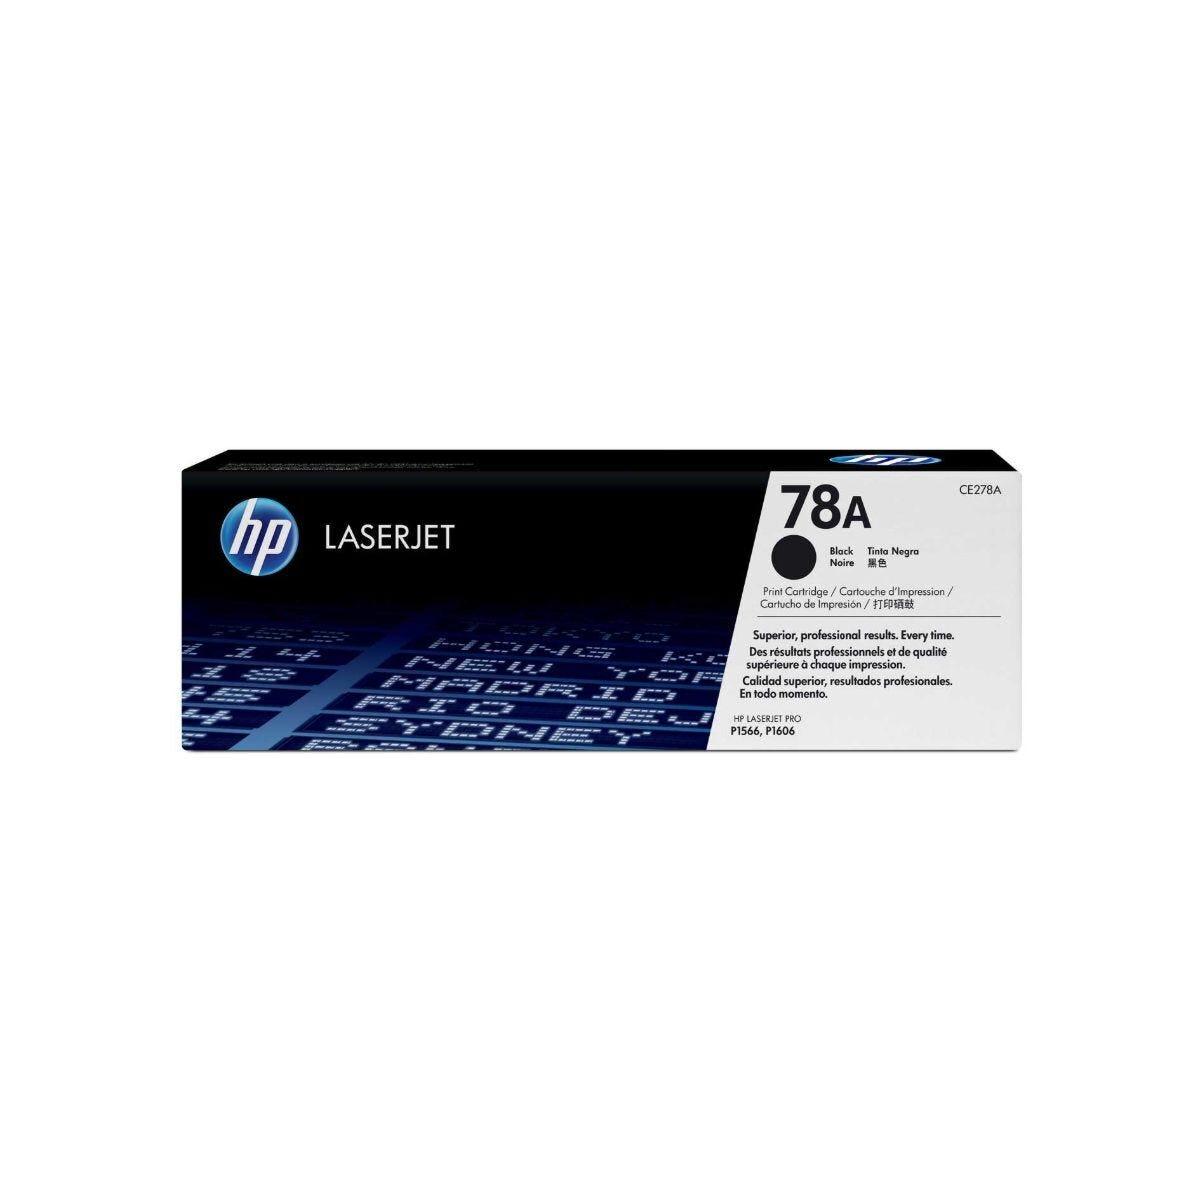 HP 78A CE278A Laser Printer Ink Toner Cartridge